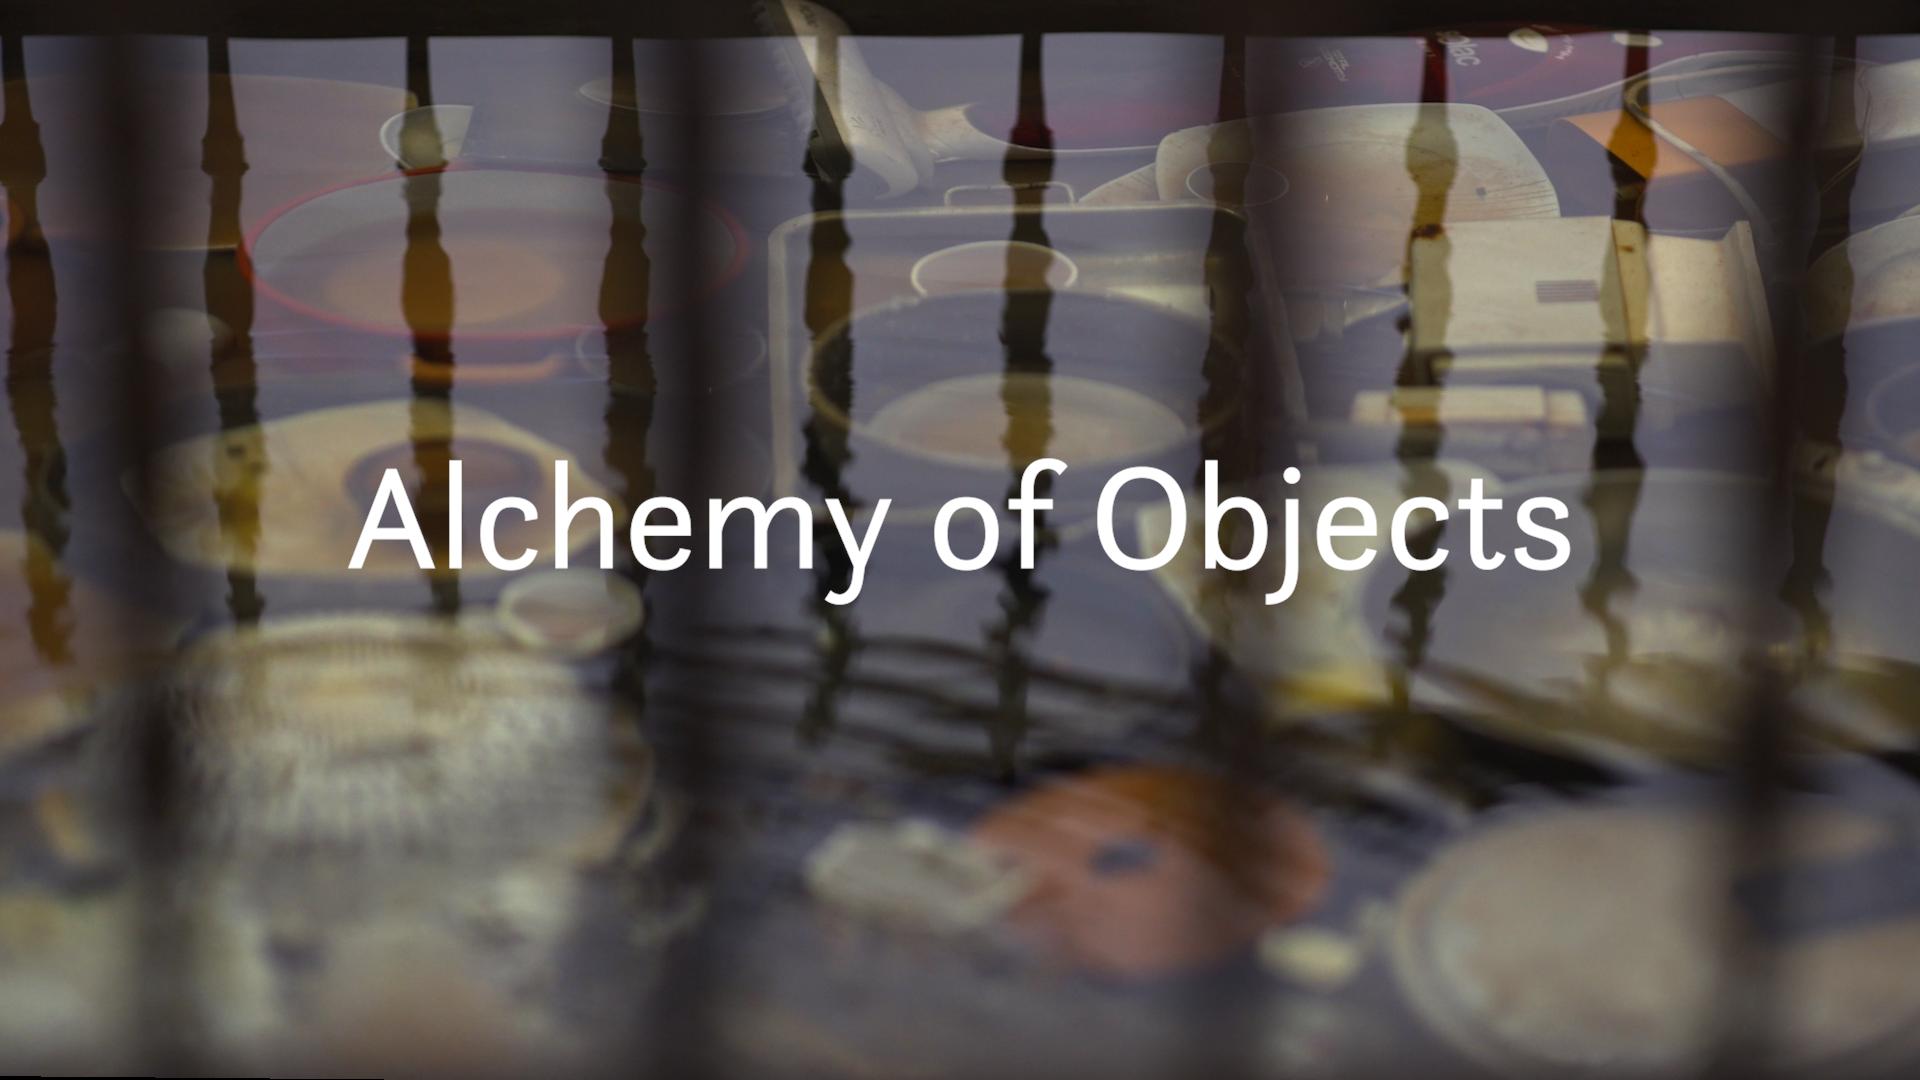 Alchemy of object-5